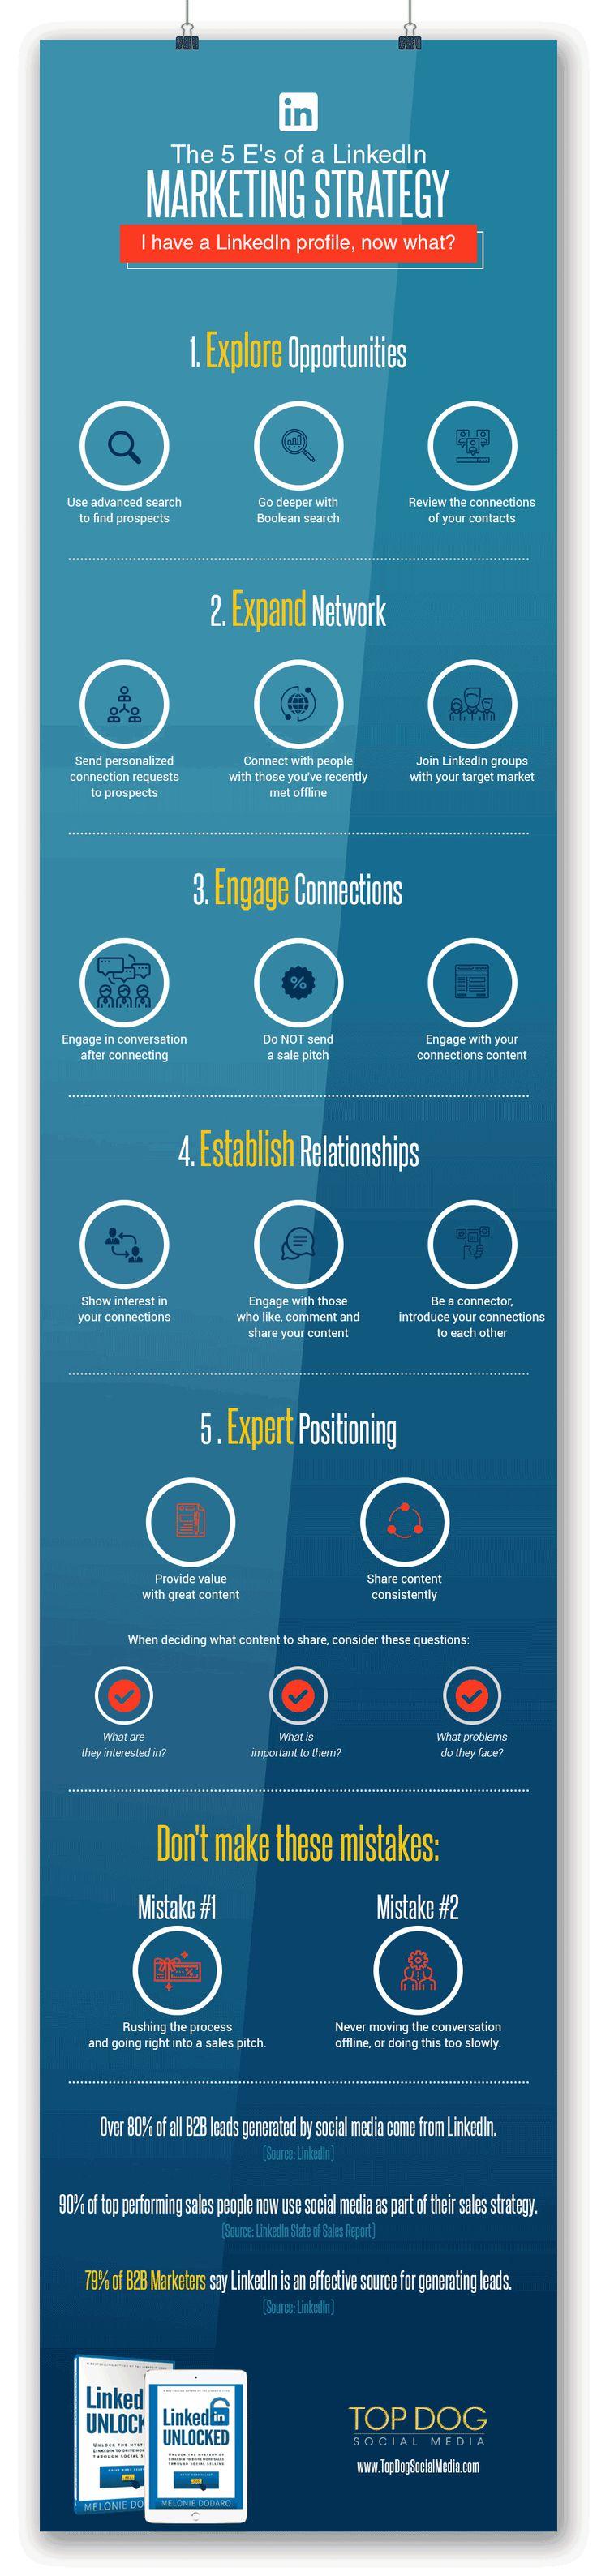 Digital Marketing : 5 Steps to Make Your LinkedIn Profile